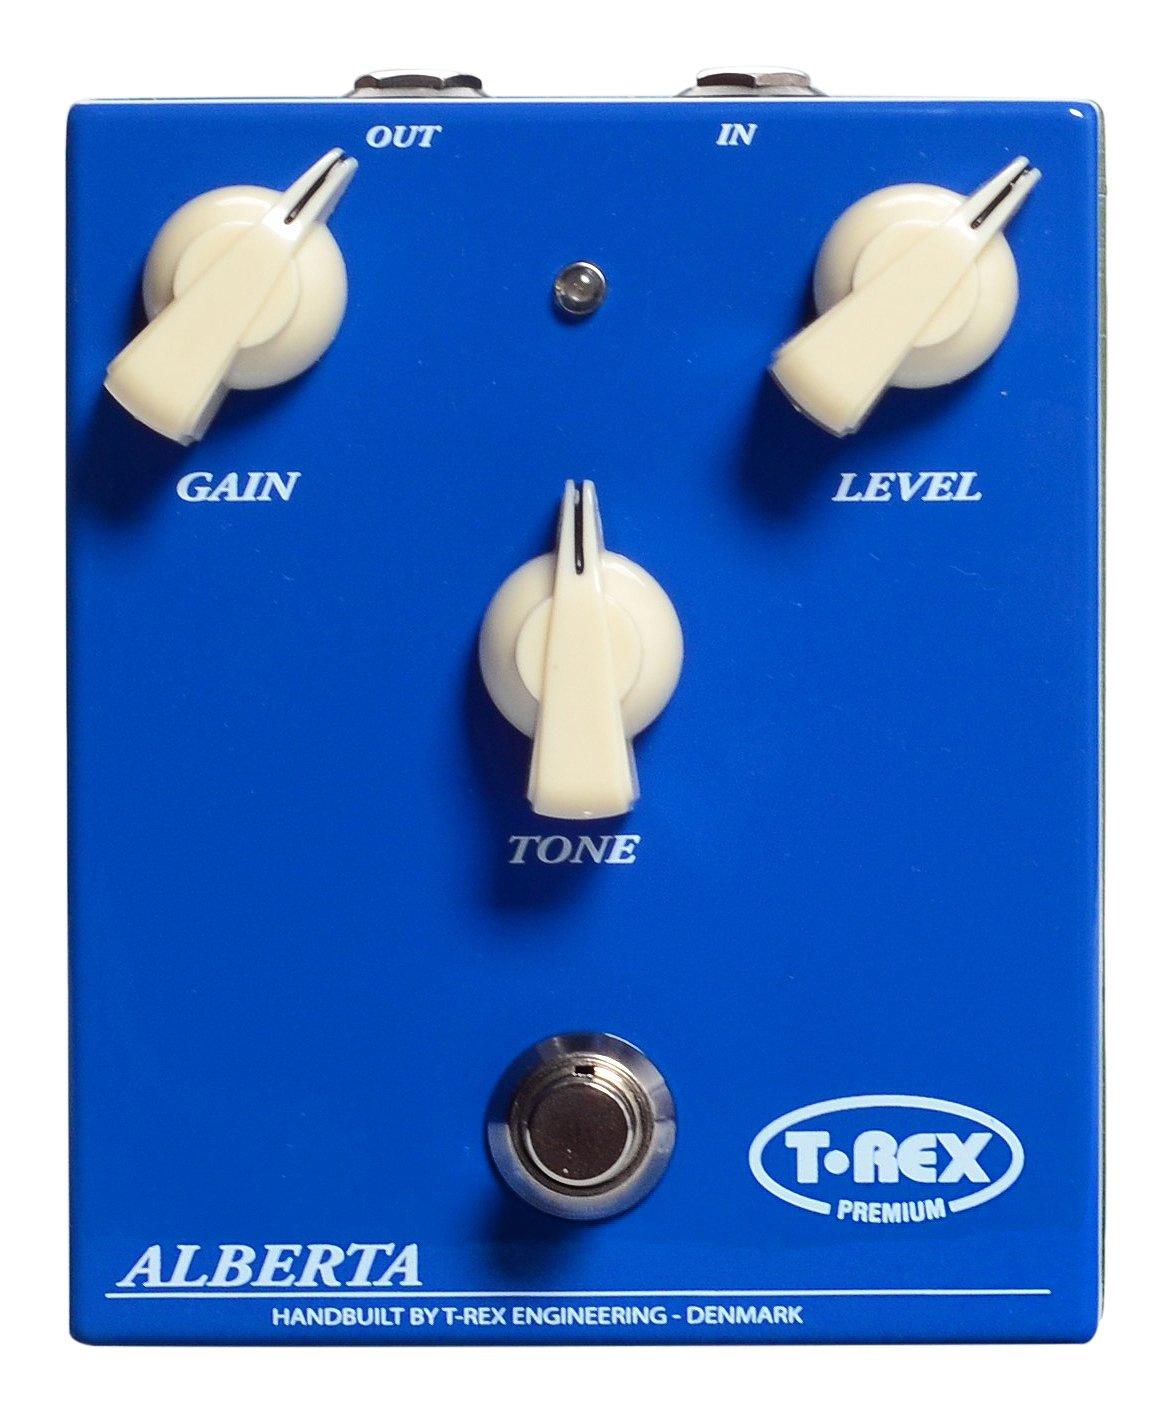 T-Rex エンジニアリング ALBERTA-CLASSIC オーバードライブ ギターエフェクトペダル ハンドワイヤー デンマーク製; ゲイン、レベル、トーン調整機能、高精度、最高品質部品(10041)   B074PPS67K